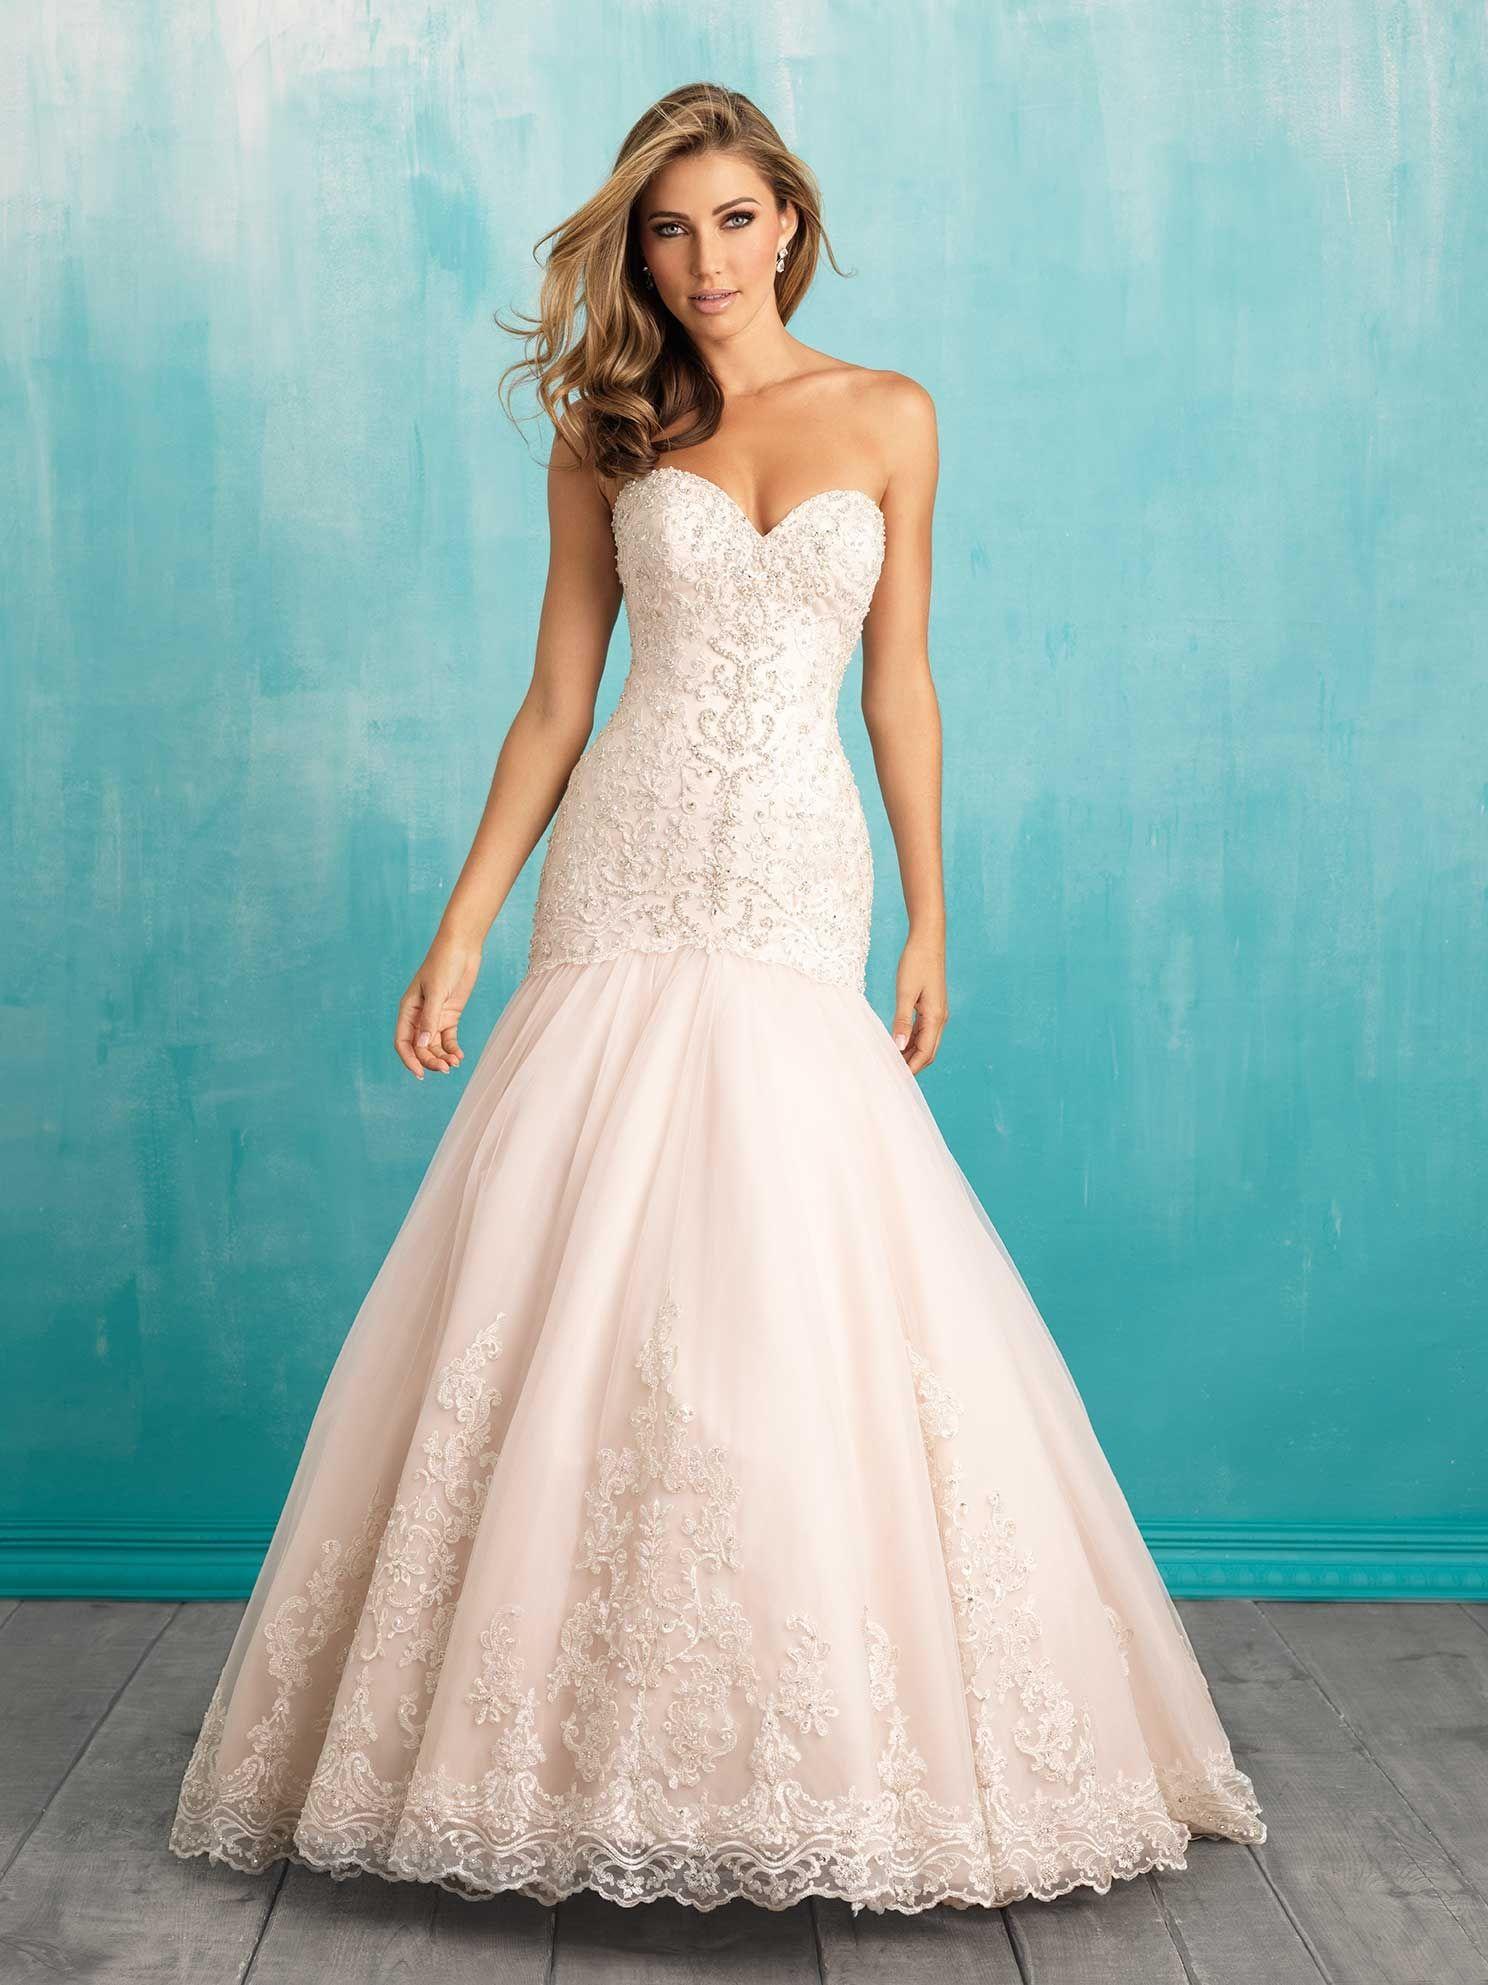 Wedding Dresses Spokane Wa - Best Shapewear for Wedding Dress Check ...